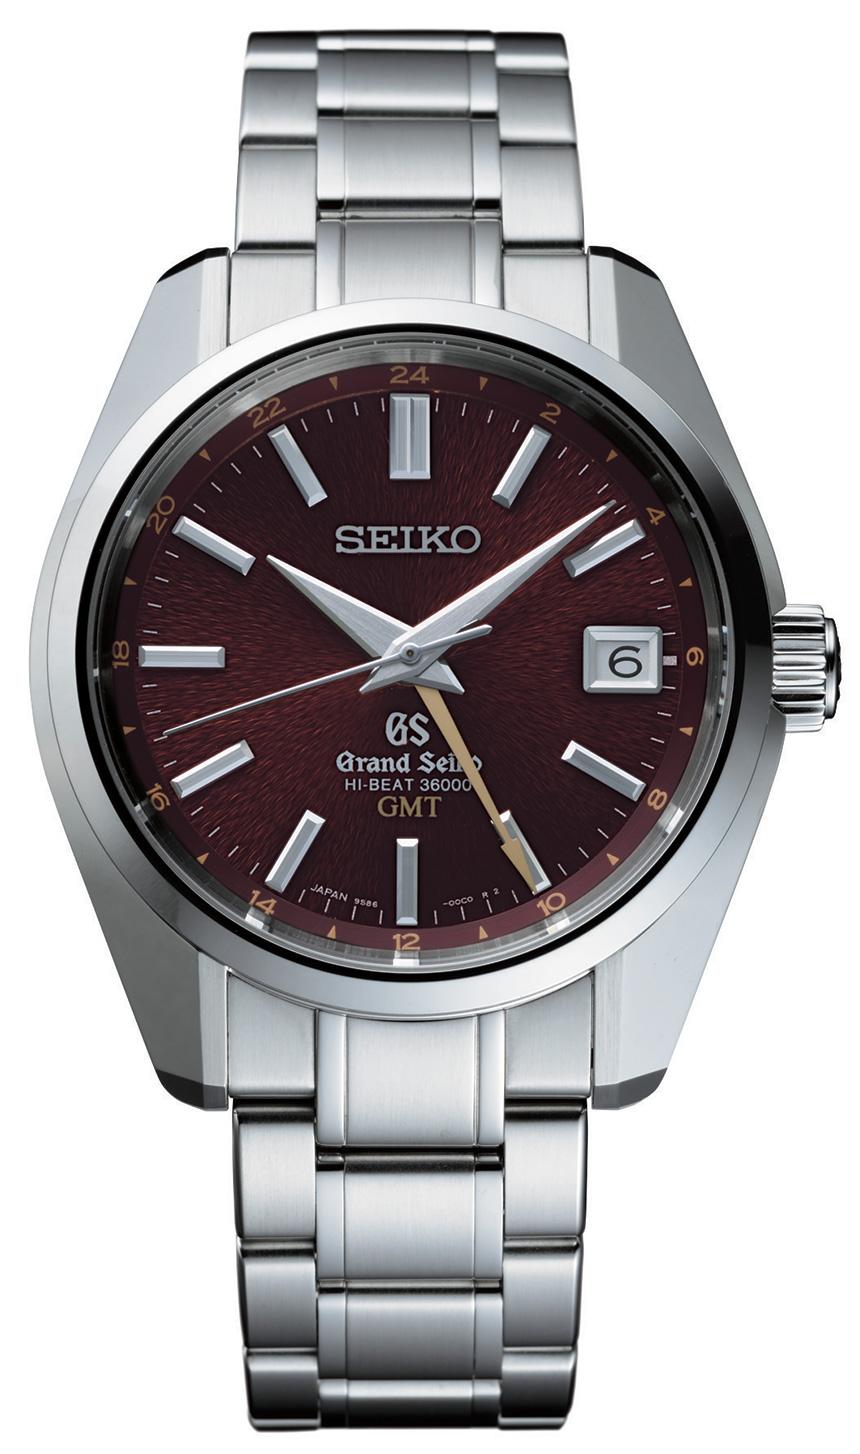 grand-seiko-hi-beat-36000-gmt-limited-edition-sbgj021-1